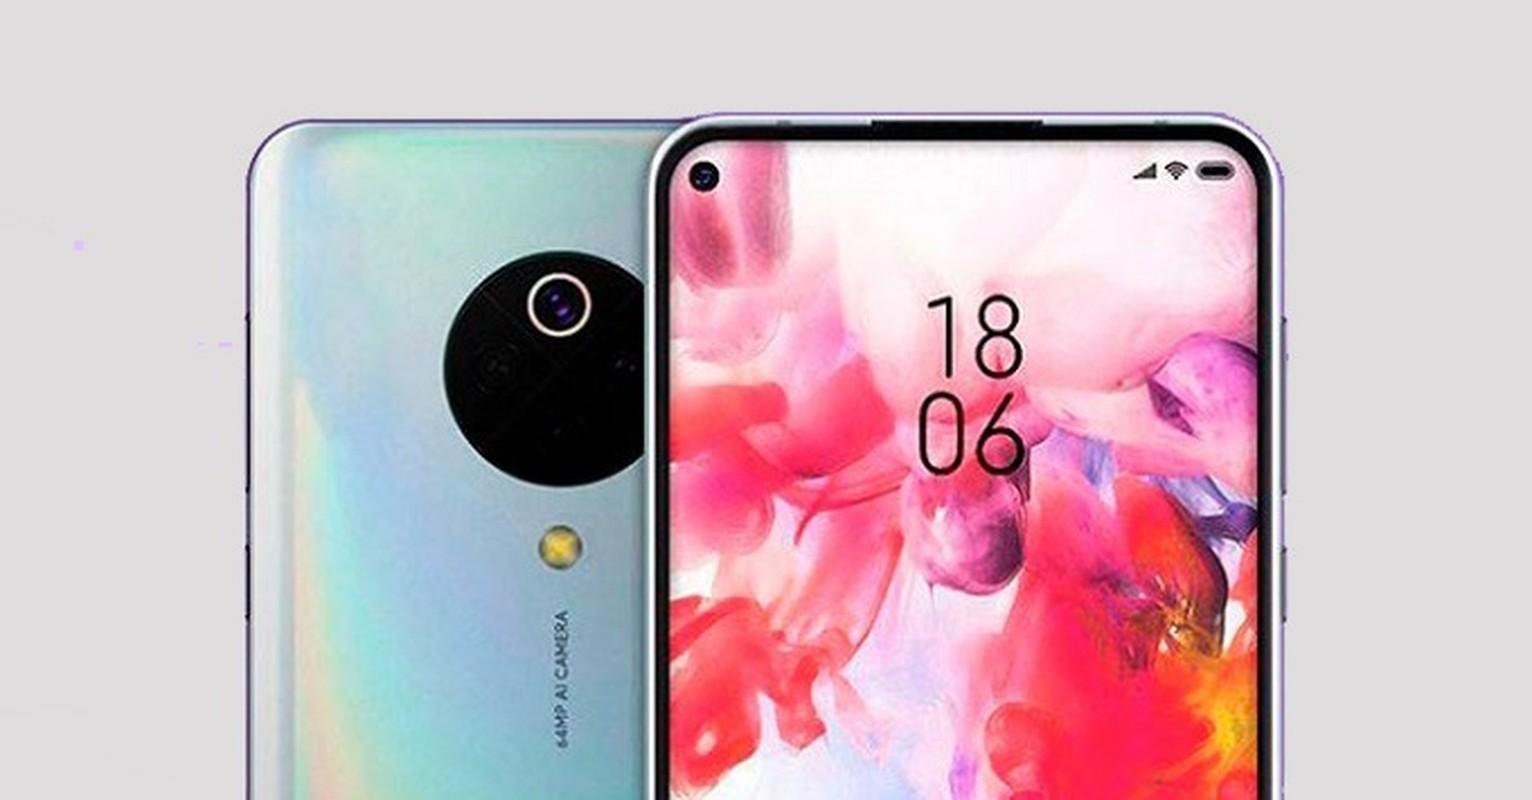 He lo smartphone co camera sieu zoom vuot mat Galaxy S20 Ultra-Hinh-2